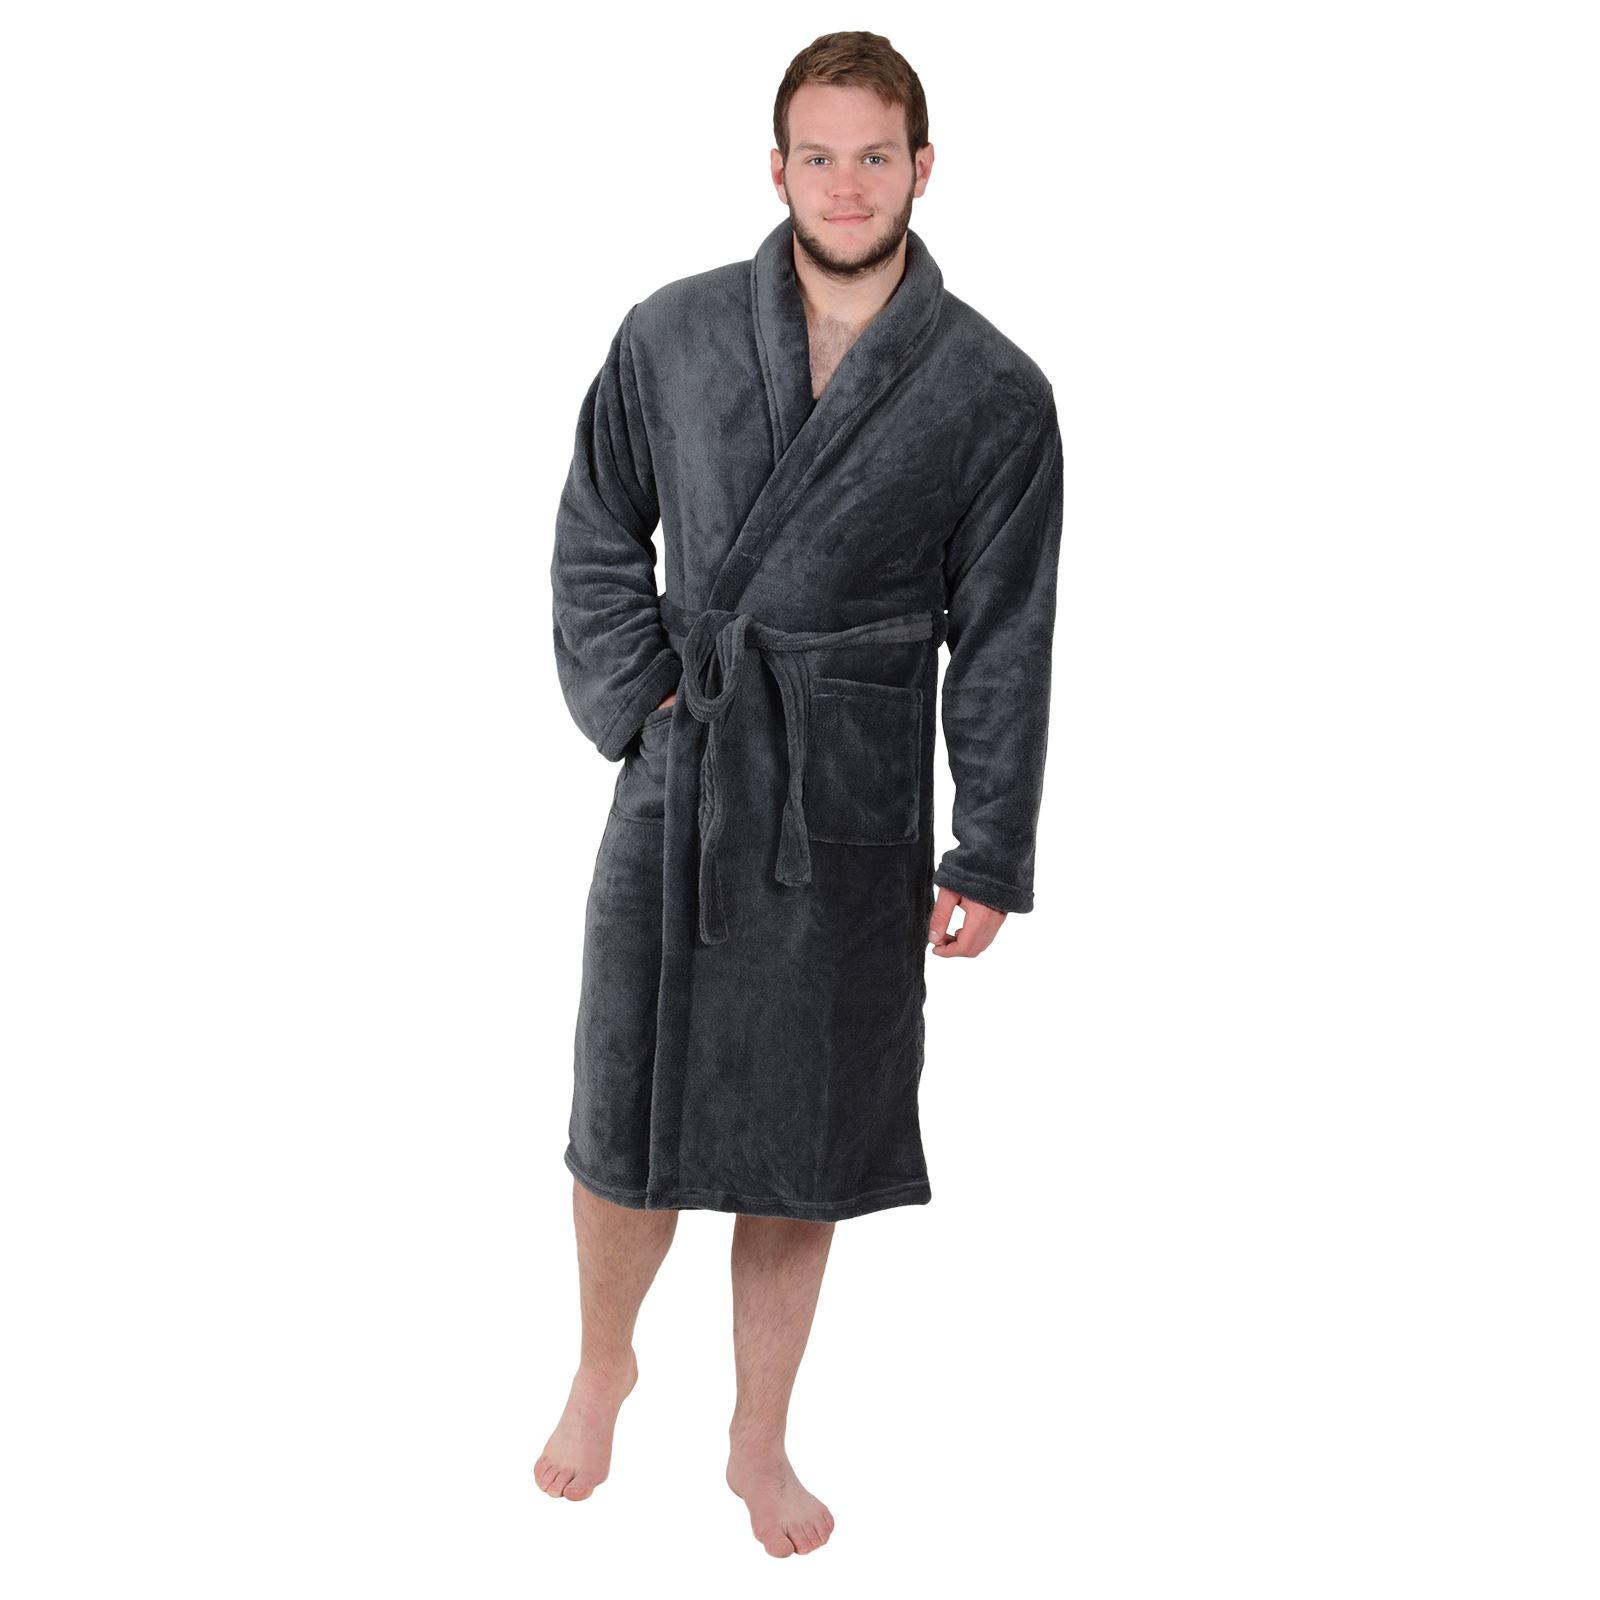 Men S Dressing Gowns Uk: Mens Luxury Coral Fleece Bath Robe Tie Belt Dressing Gown